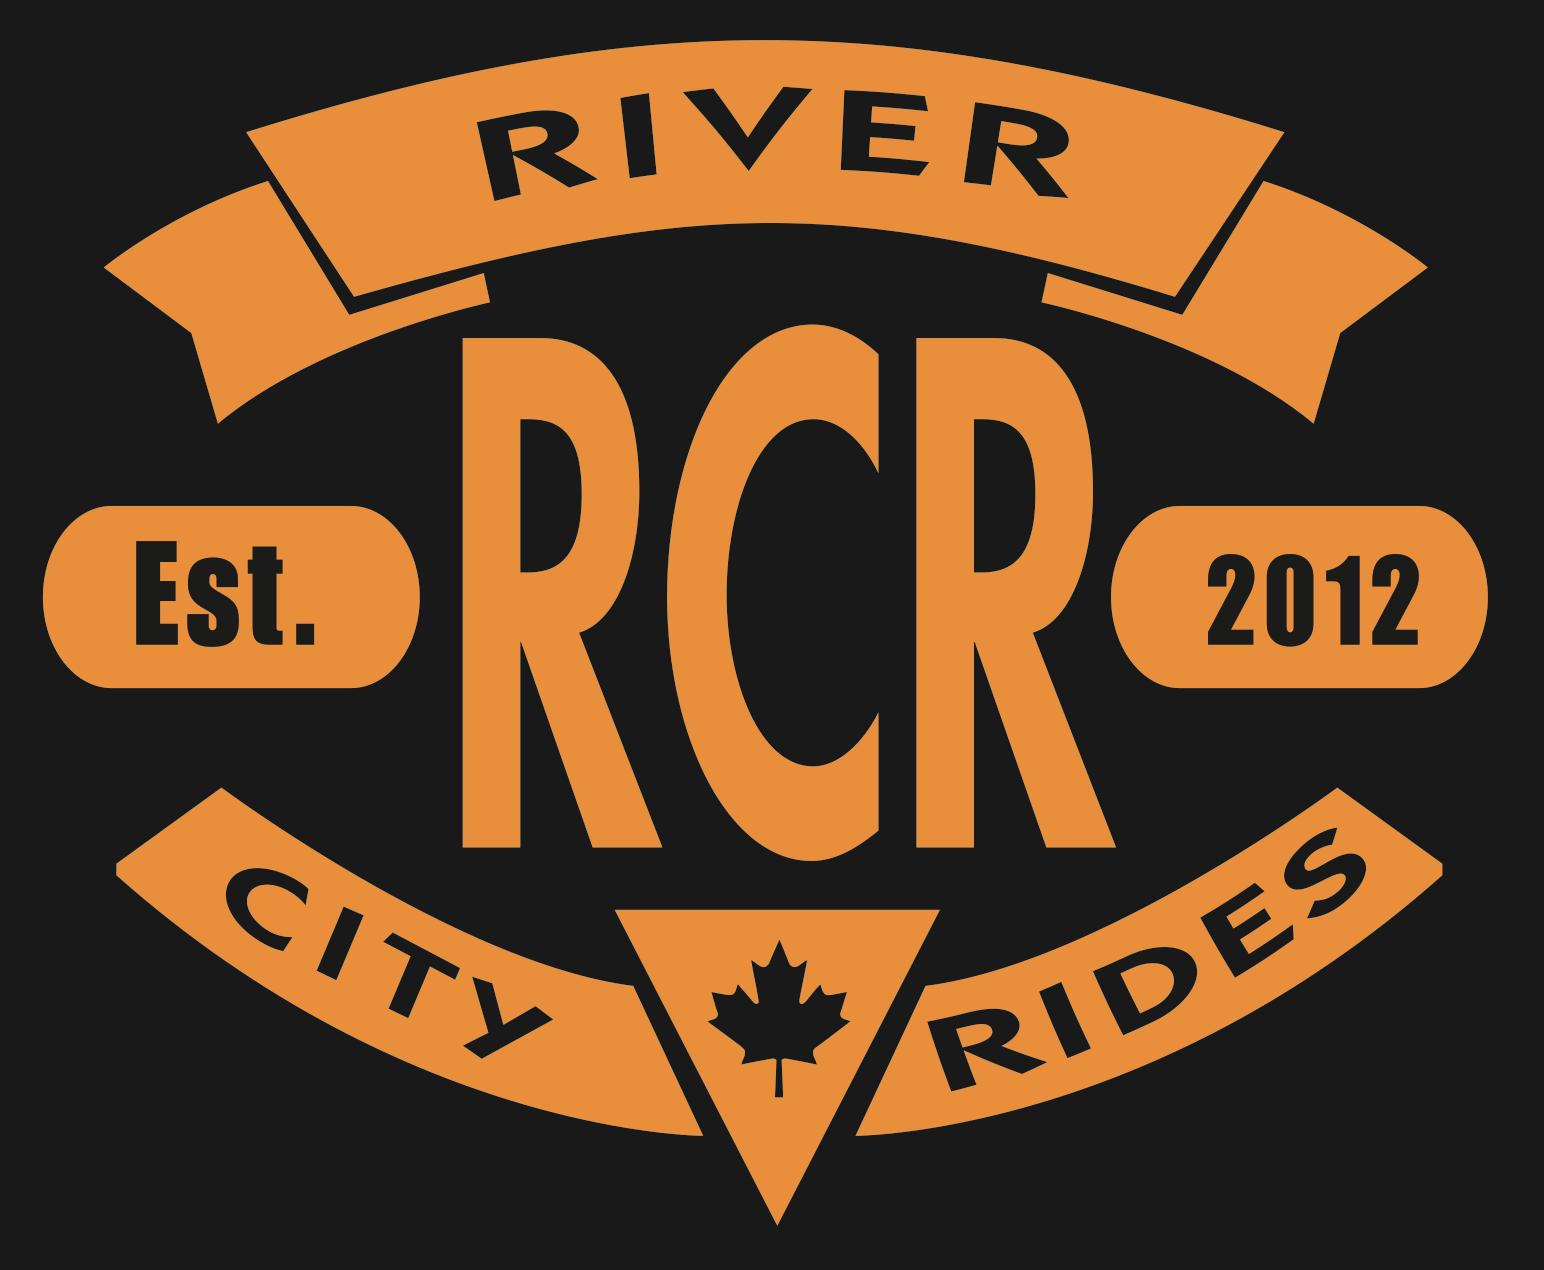 River City Rides Patch